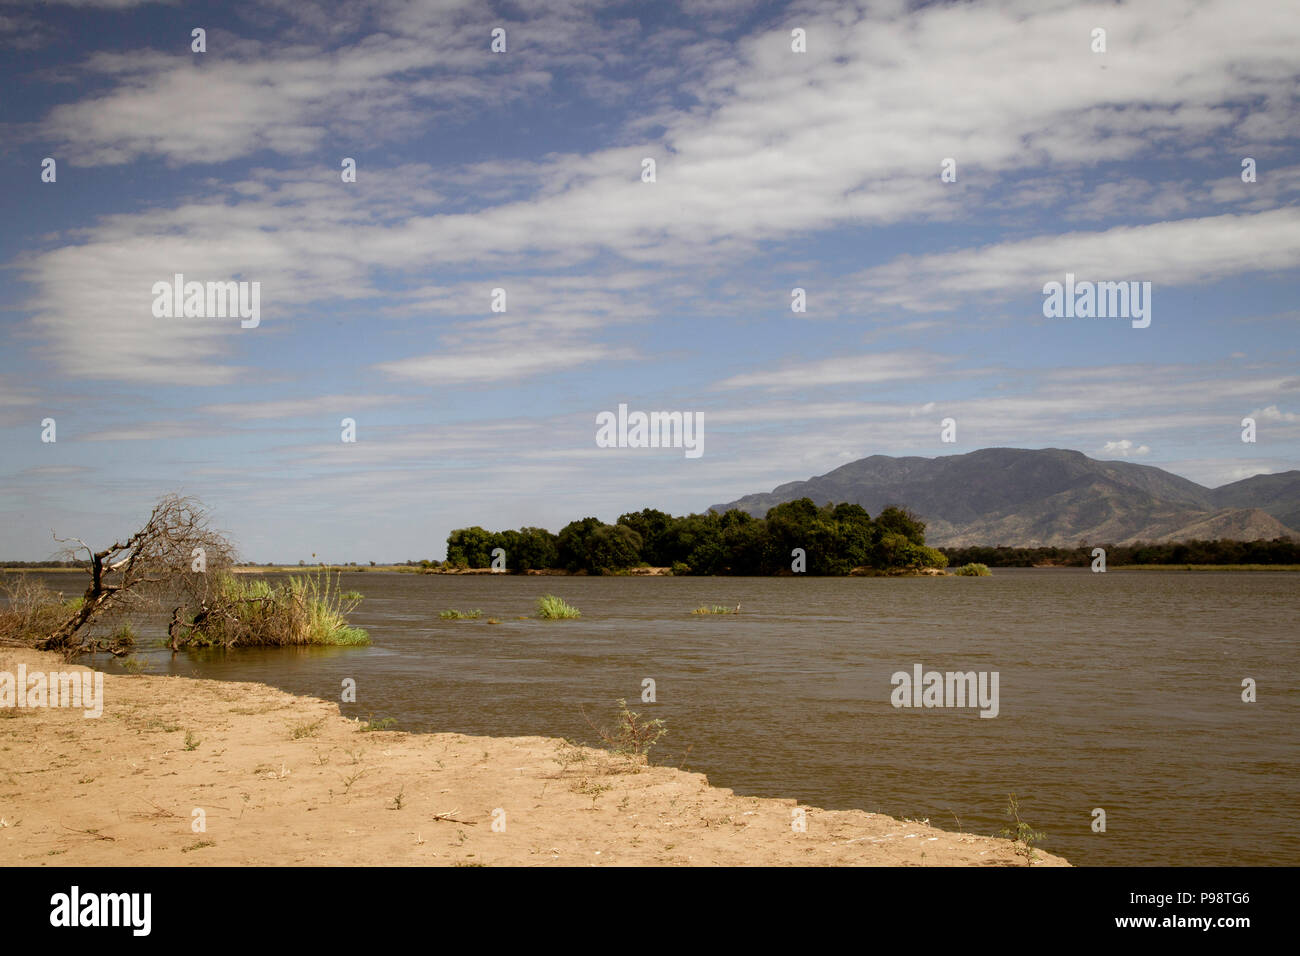 Vue sur le fleuve Zambèze à Mana Pools, au Zimbabwe, en regardant vers la Zambie Photo Stock